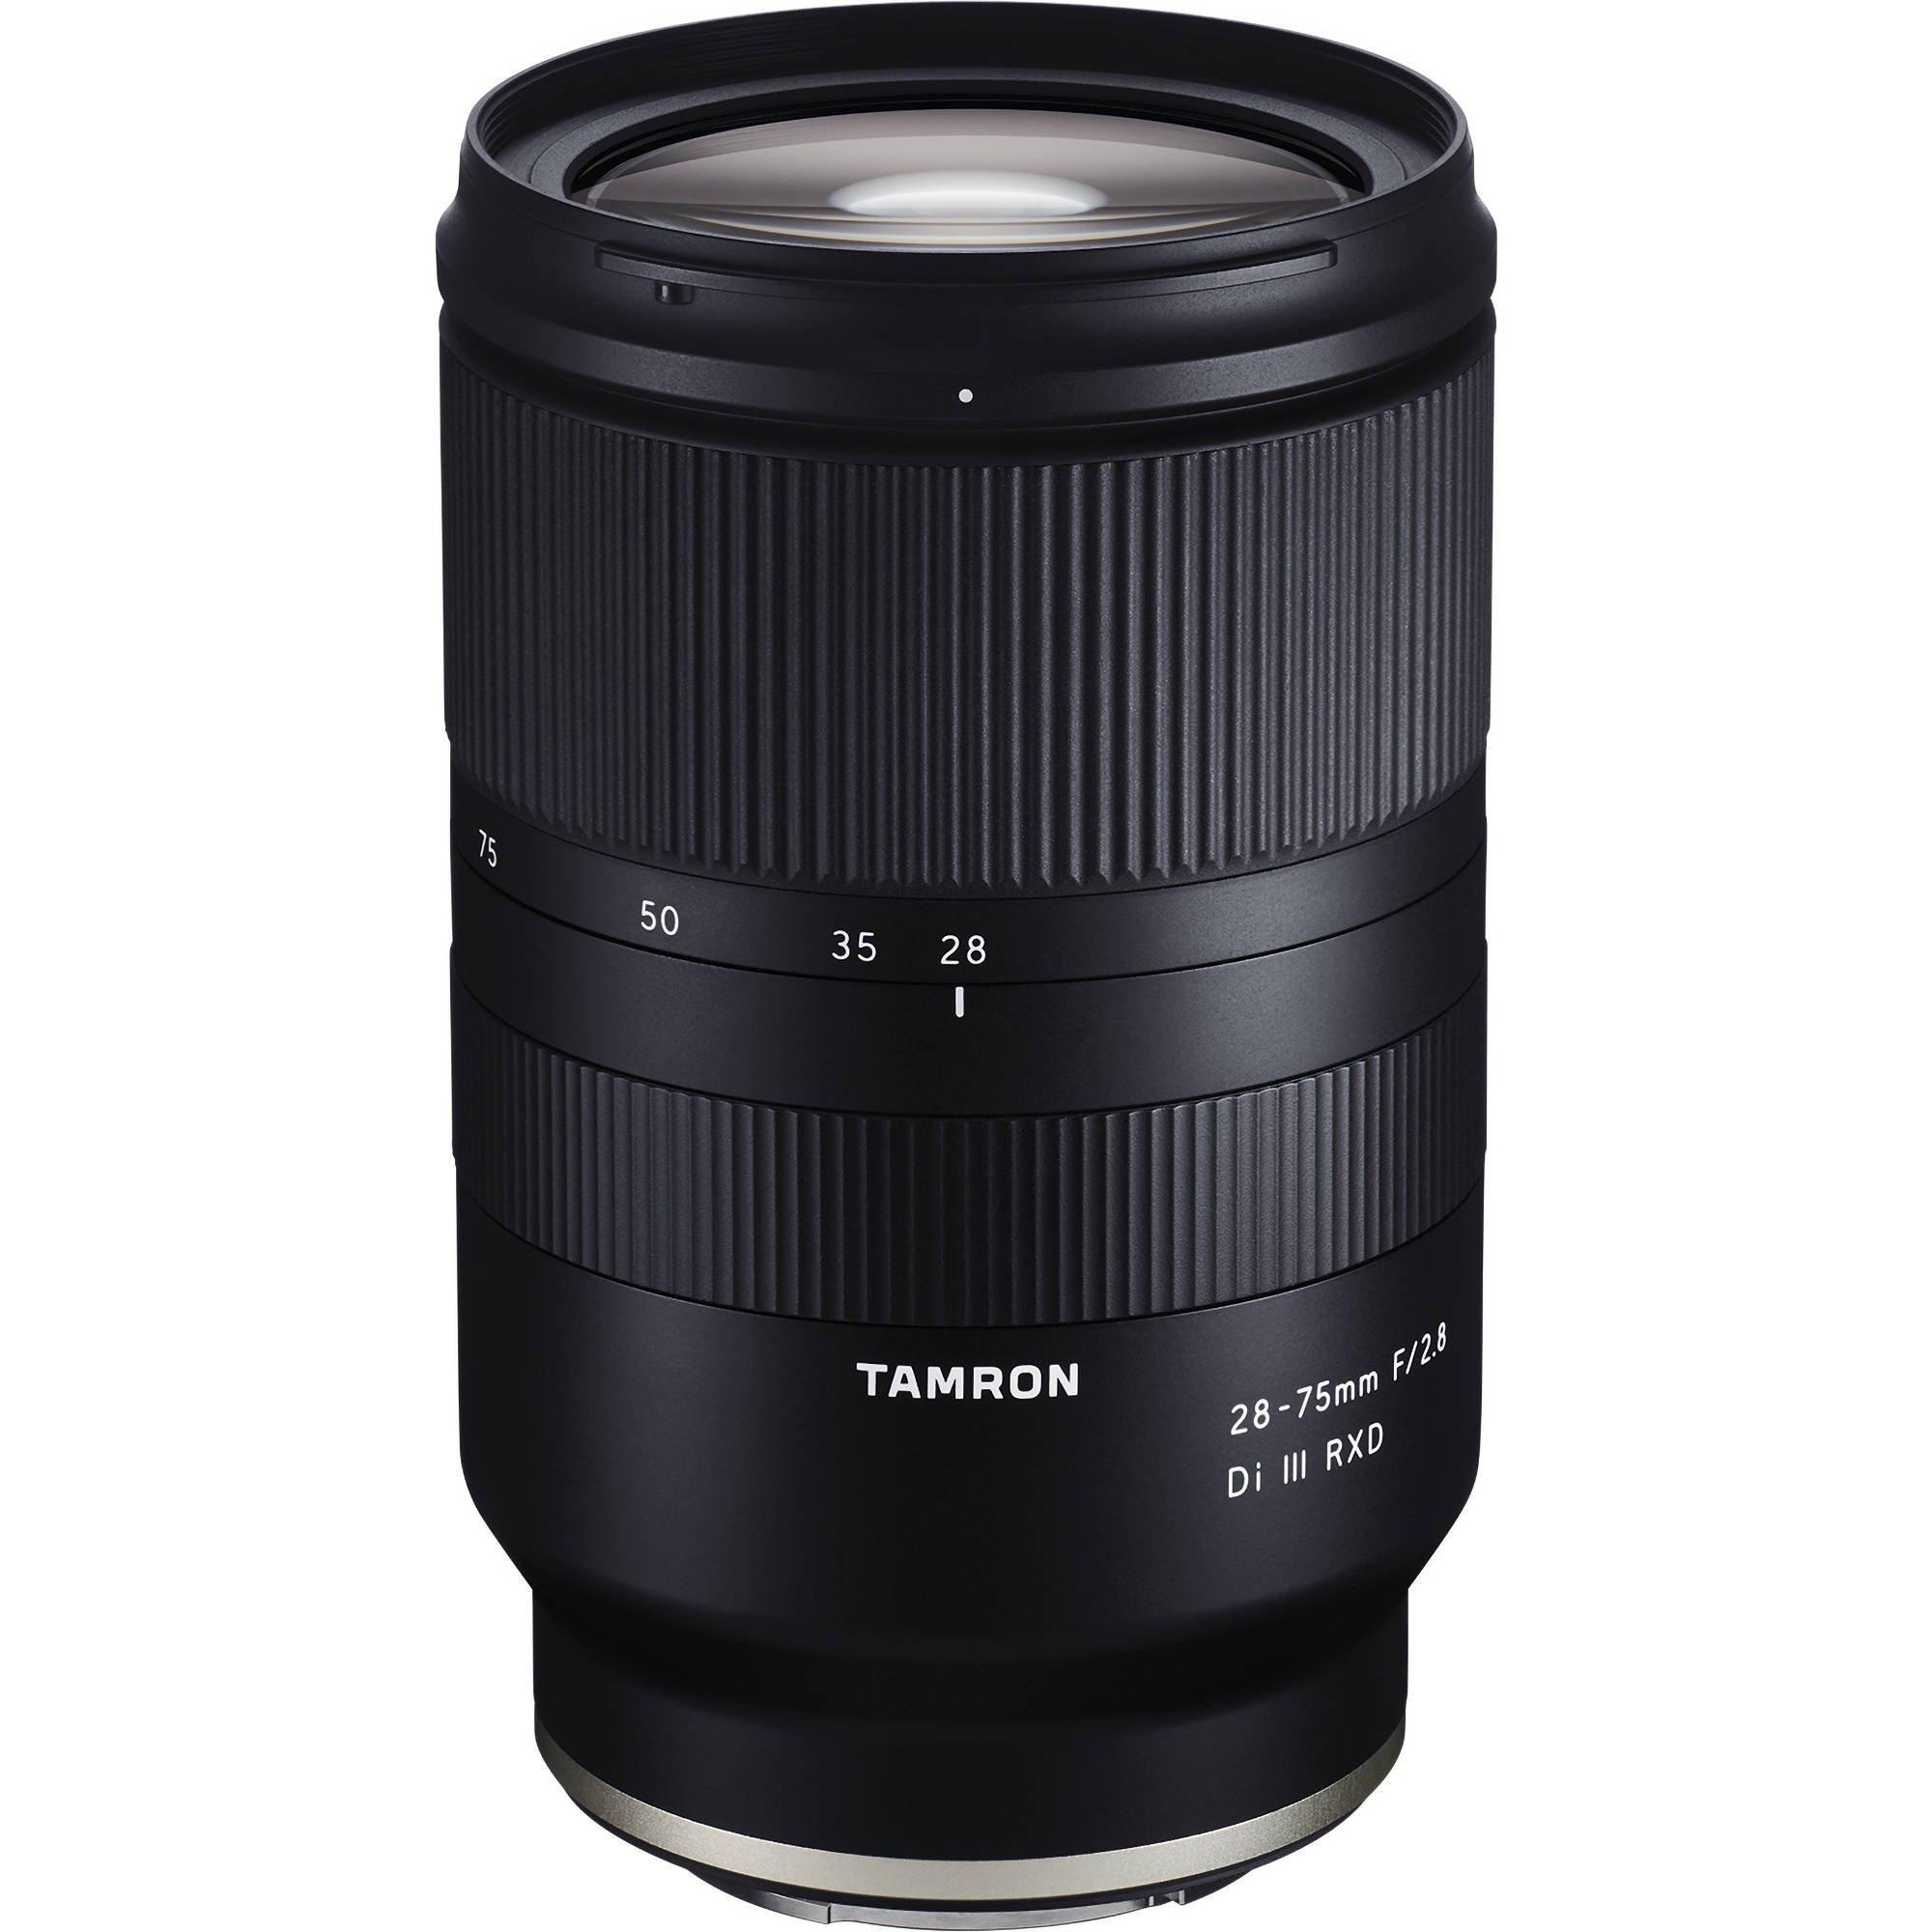 Tamron 28-75 f/2.8 Lens